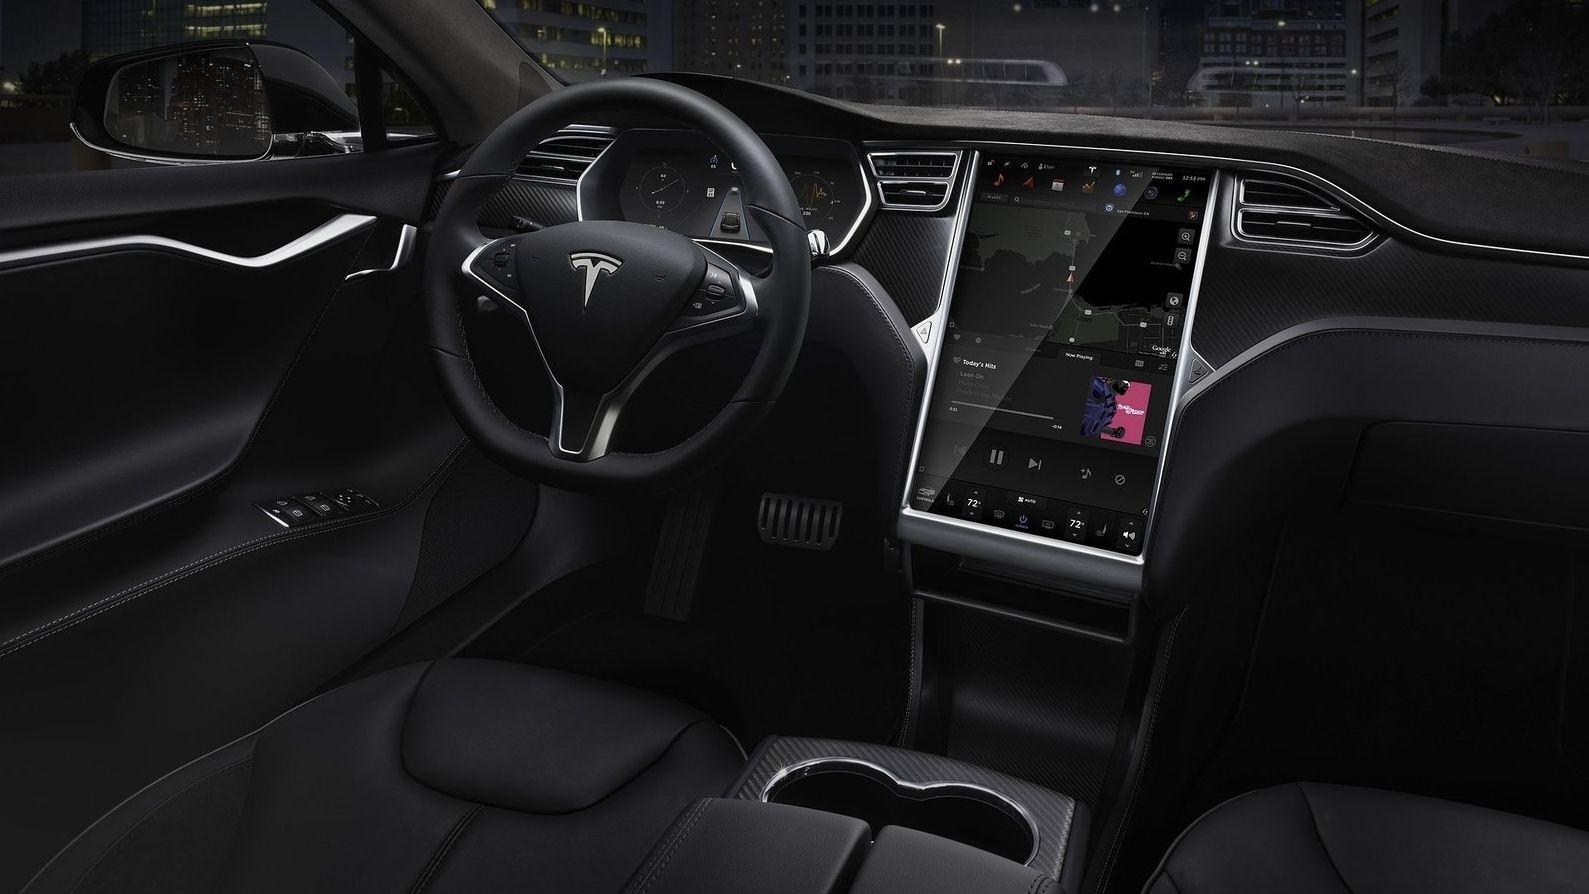 Muž kúpil ojazdenú Teslu Model S a zaplatil za funkciu autopilota, automobilka mu ju následne vypla